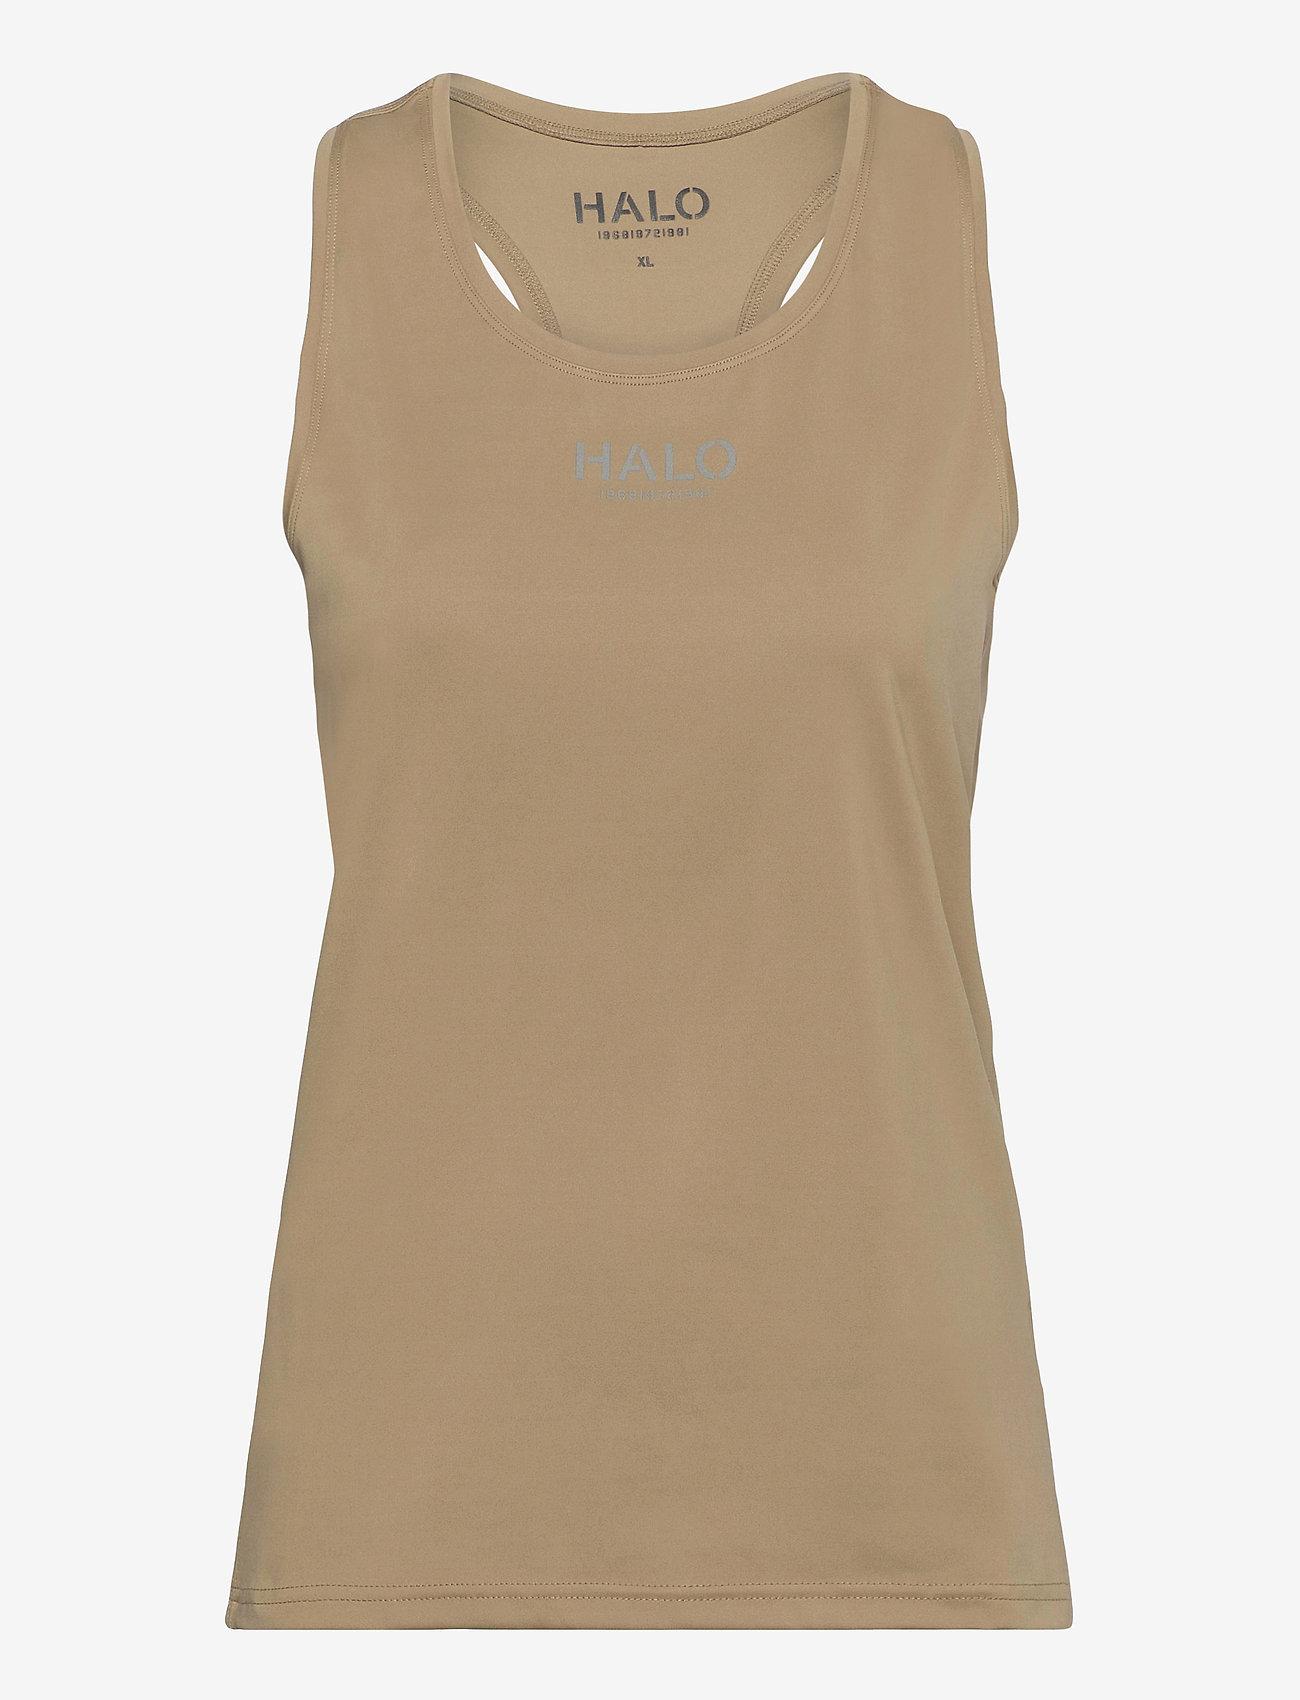 HALO - HALO WOMENS RACERBACK TANK - Ärmellose tops - kelp - 1